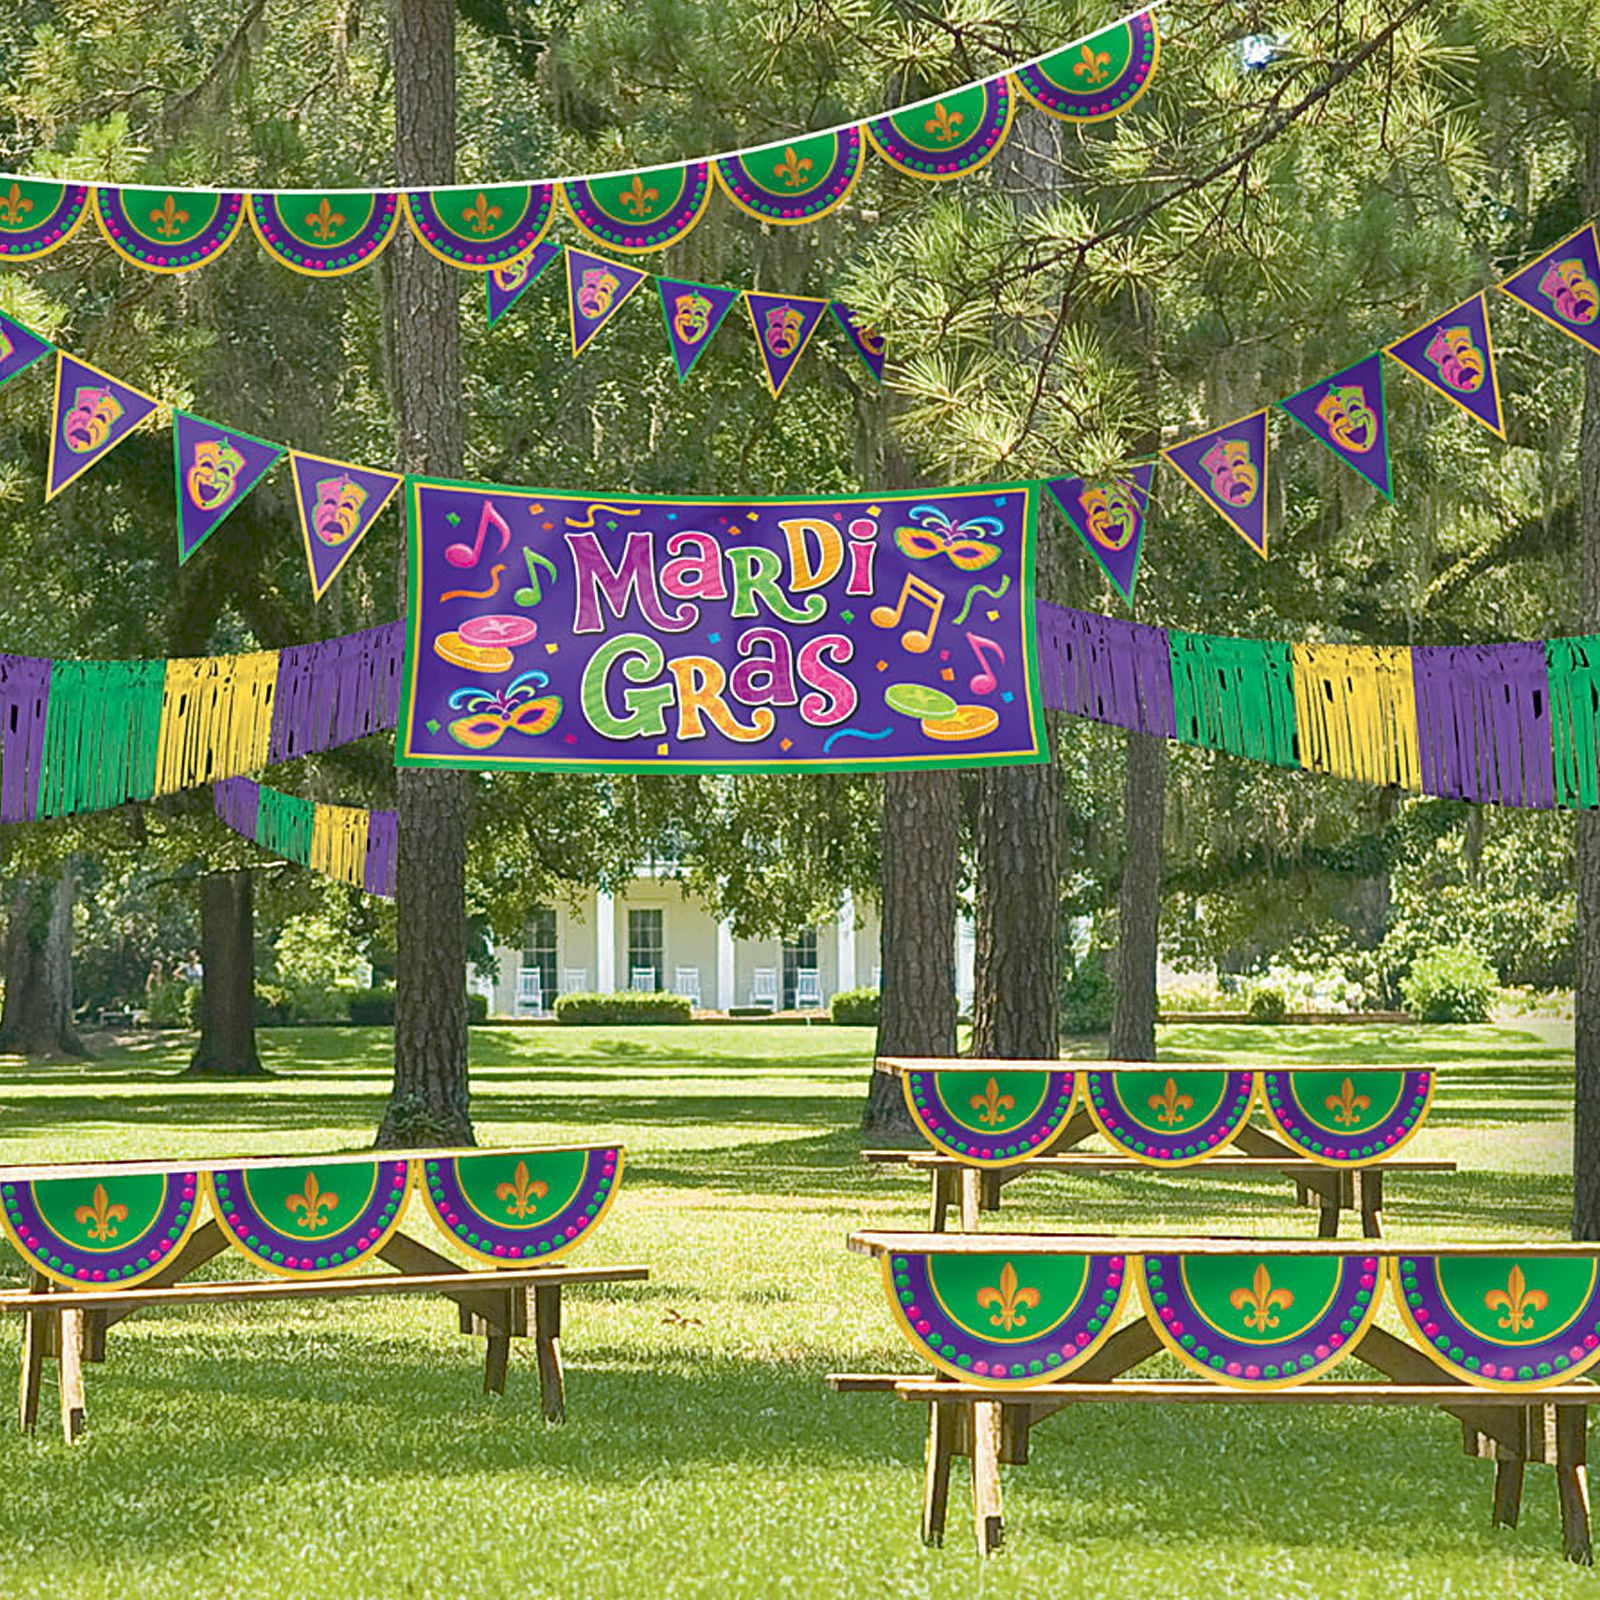 mardi gras decorating ideas outdoor   garden decor   pinterest